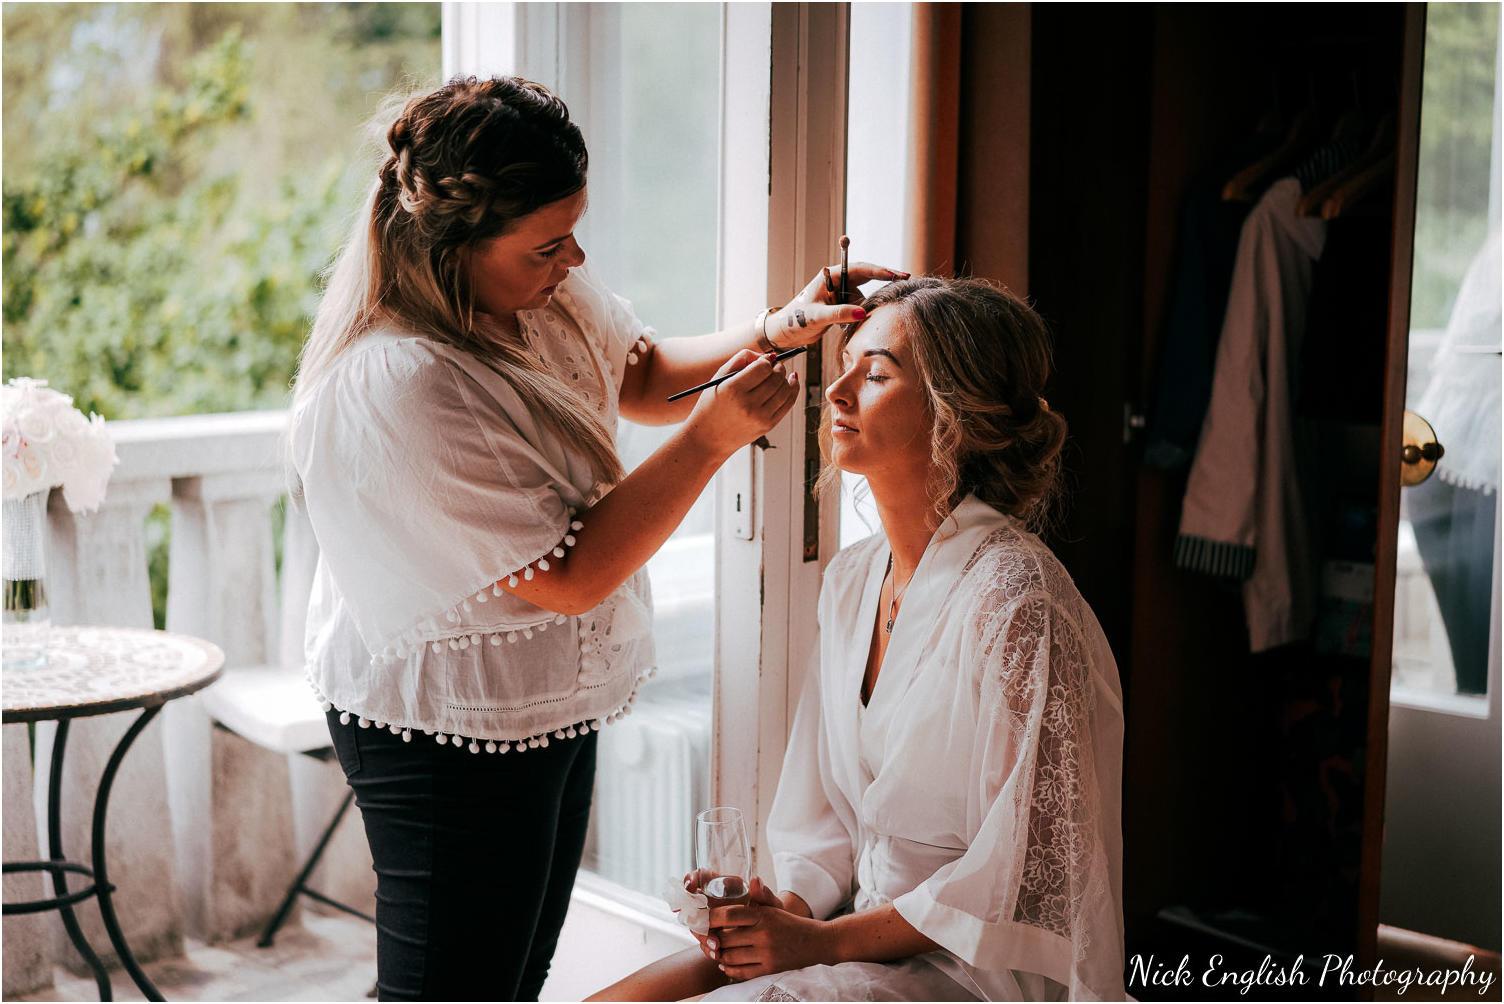 Destination_Wedding_Photographer_Slovenia_Nick_English_Photography-22.jpg